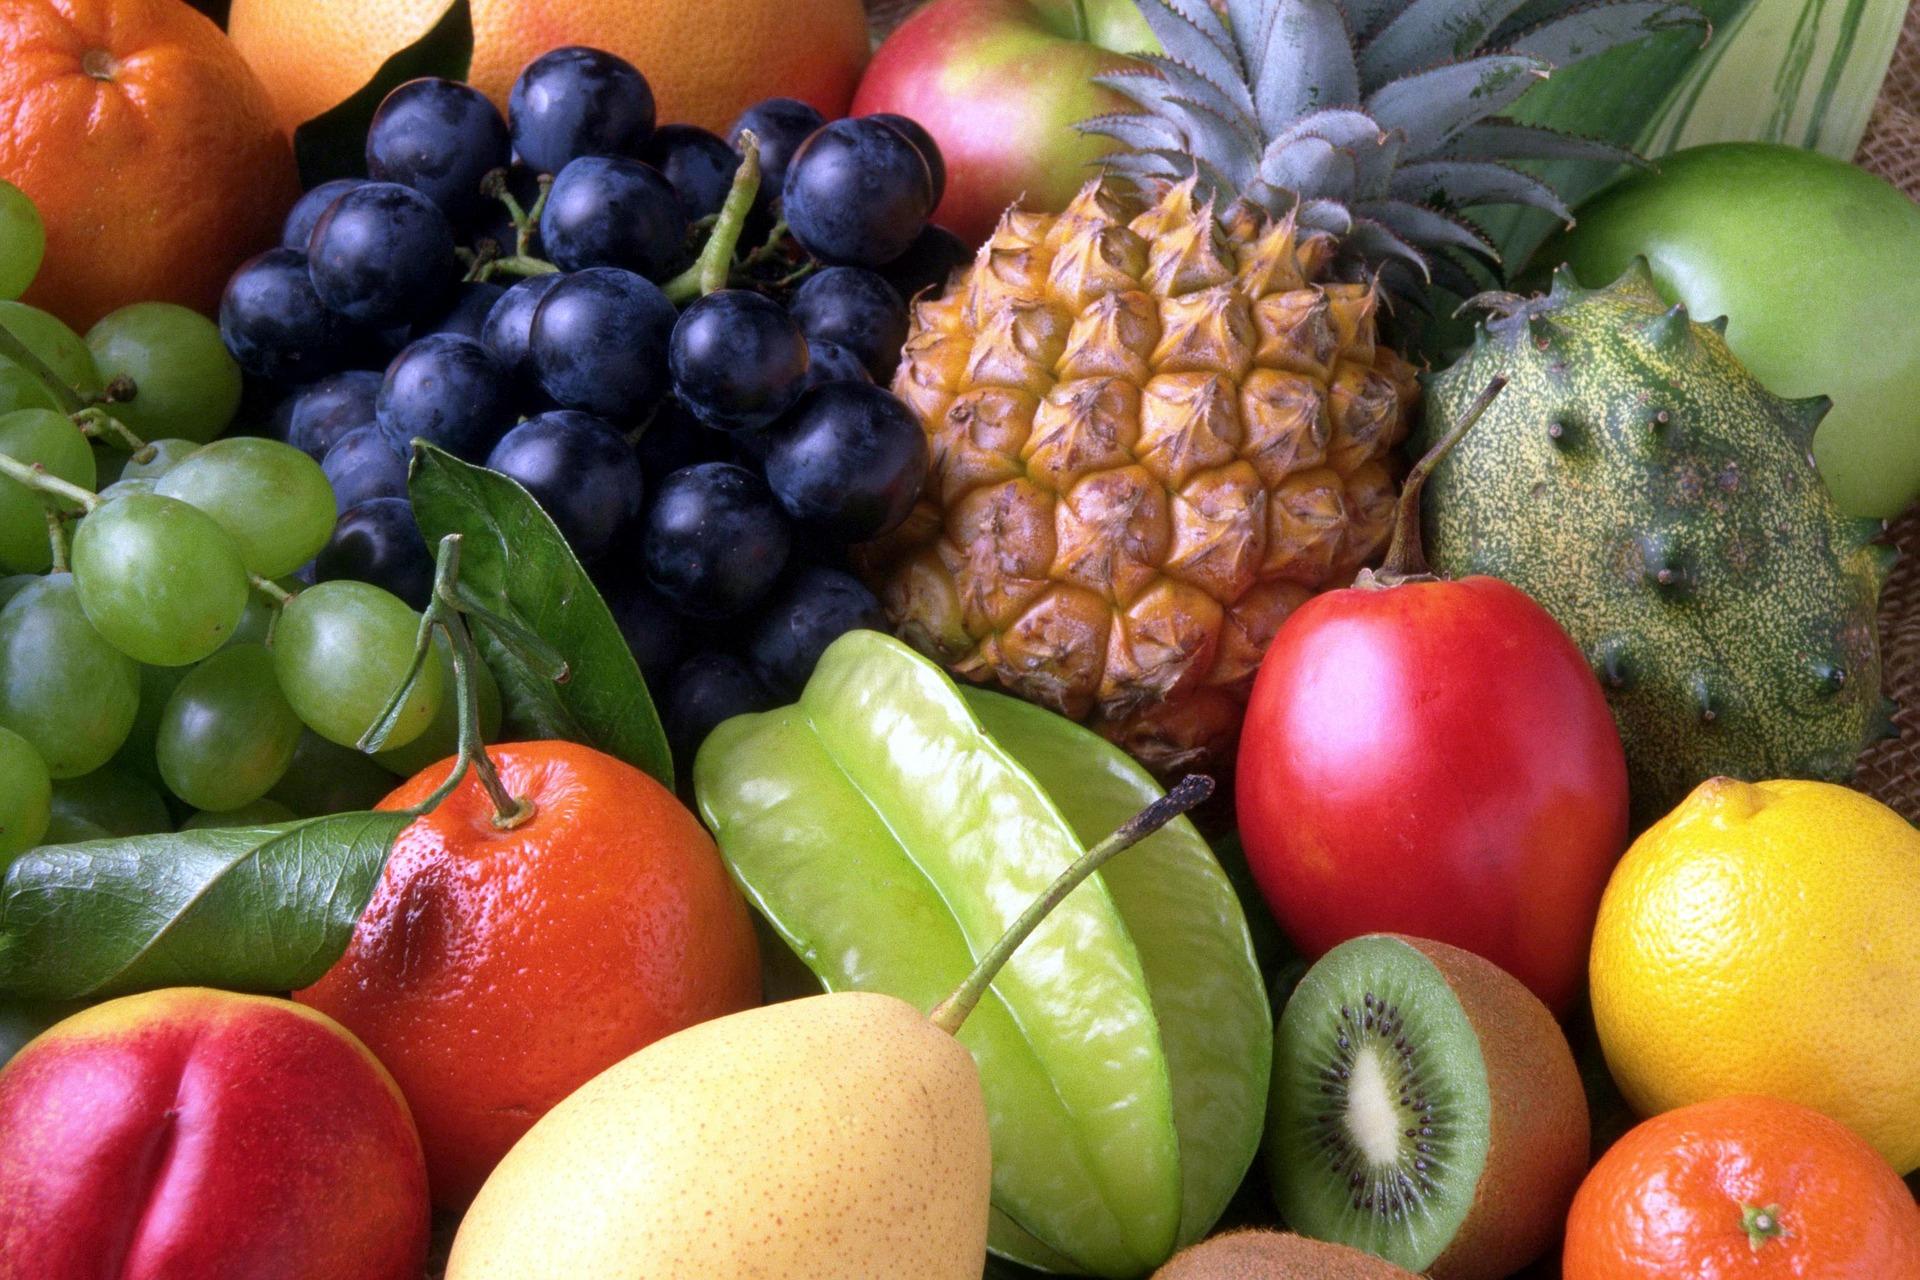 fruits-82524_1920.jpg